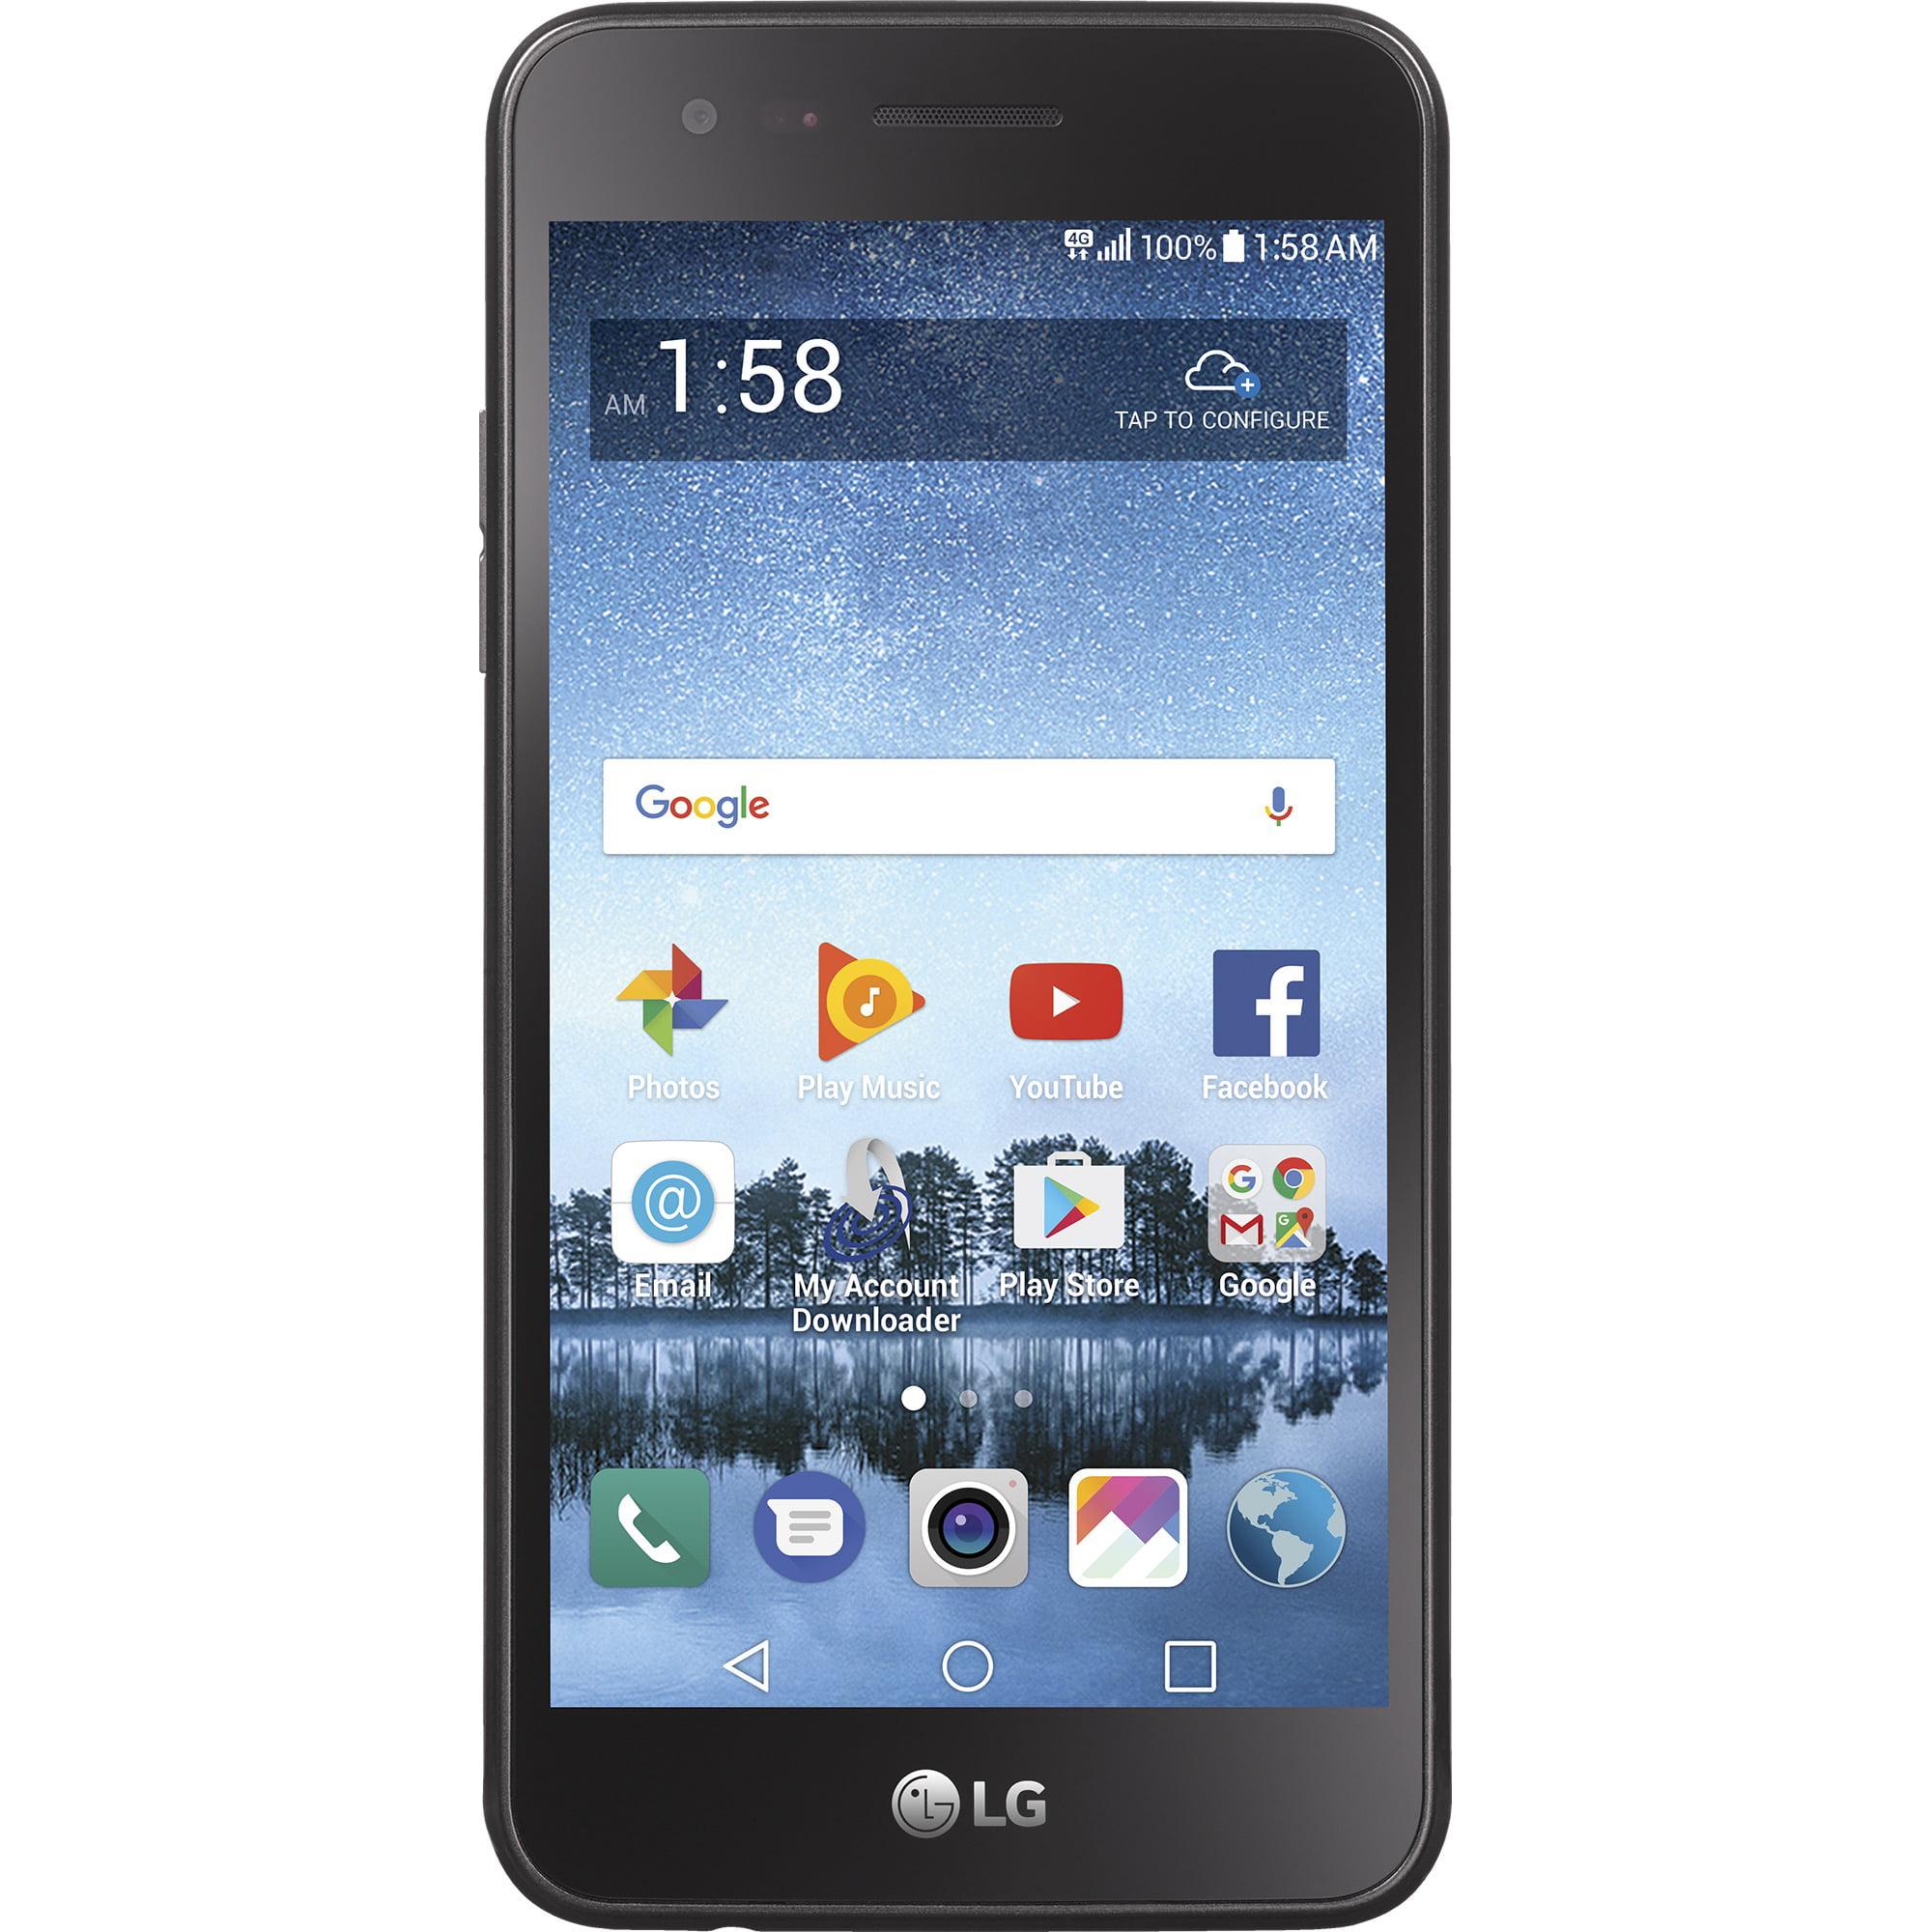 Walmart Family Mobile LG Rebel 3 Prepaid Smartphone